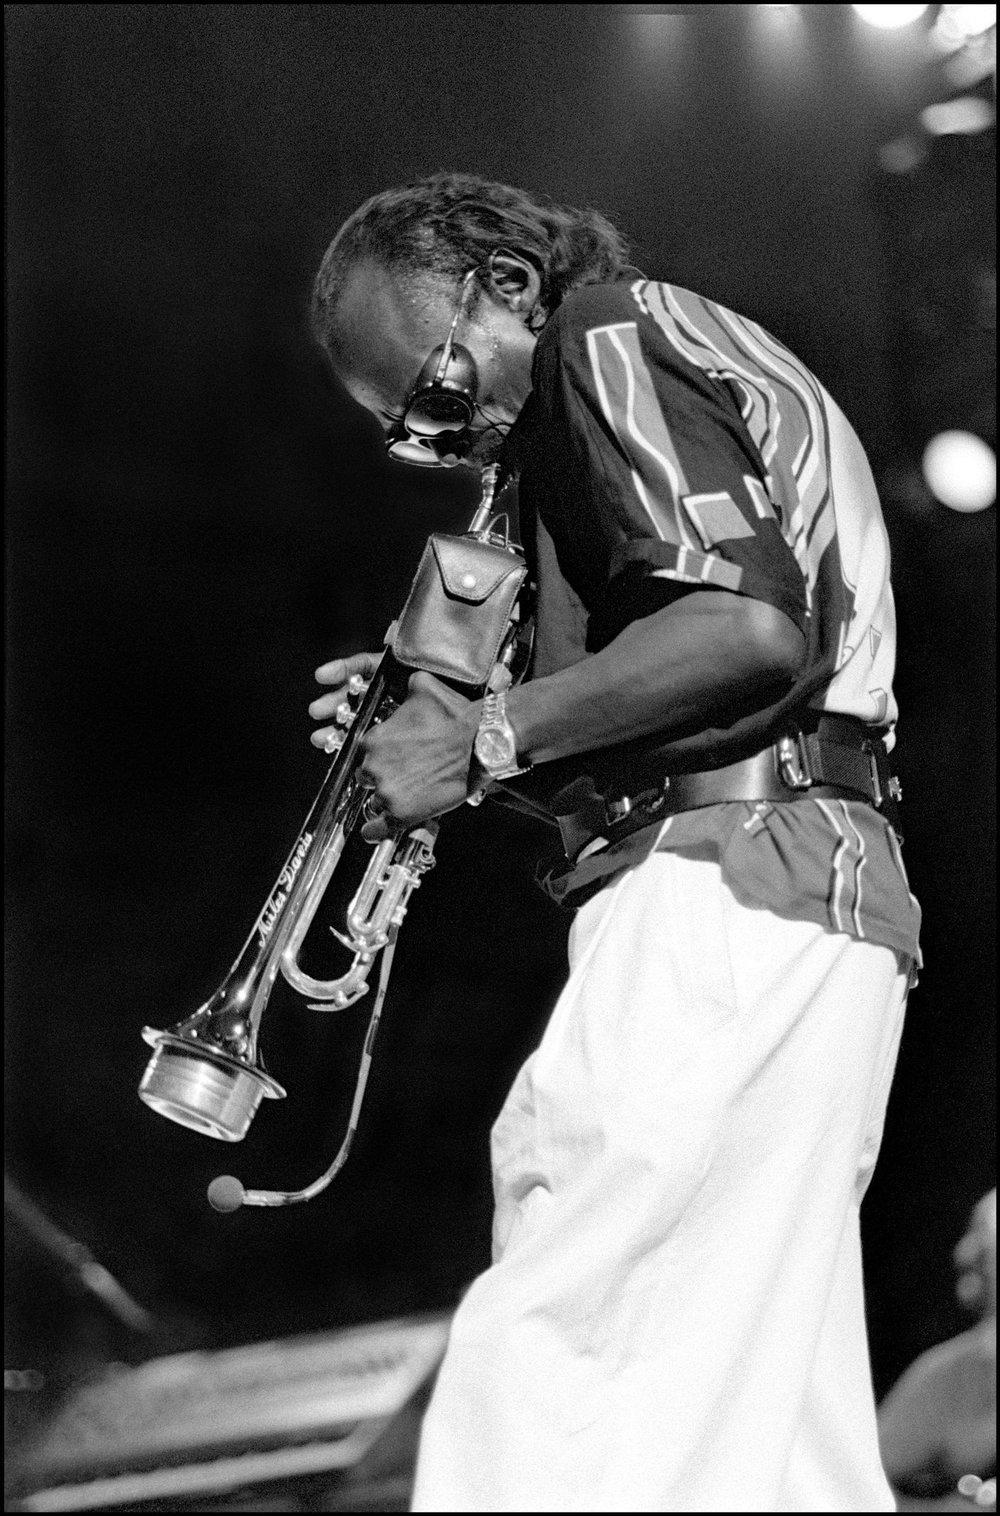 Miles Davies, Royal Festival Hall, London, UK, 20th July 1985